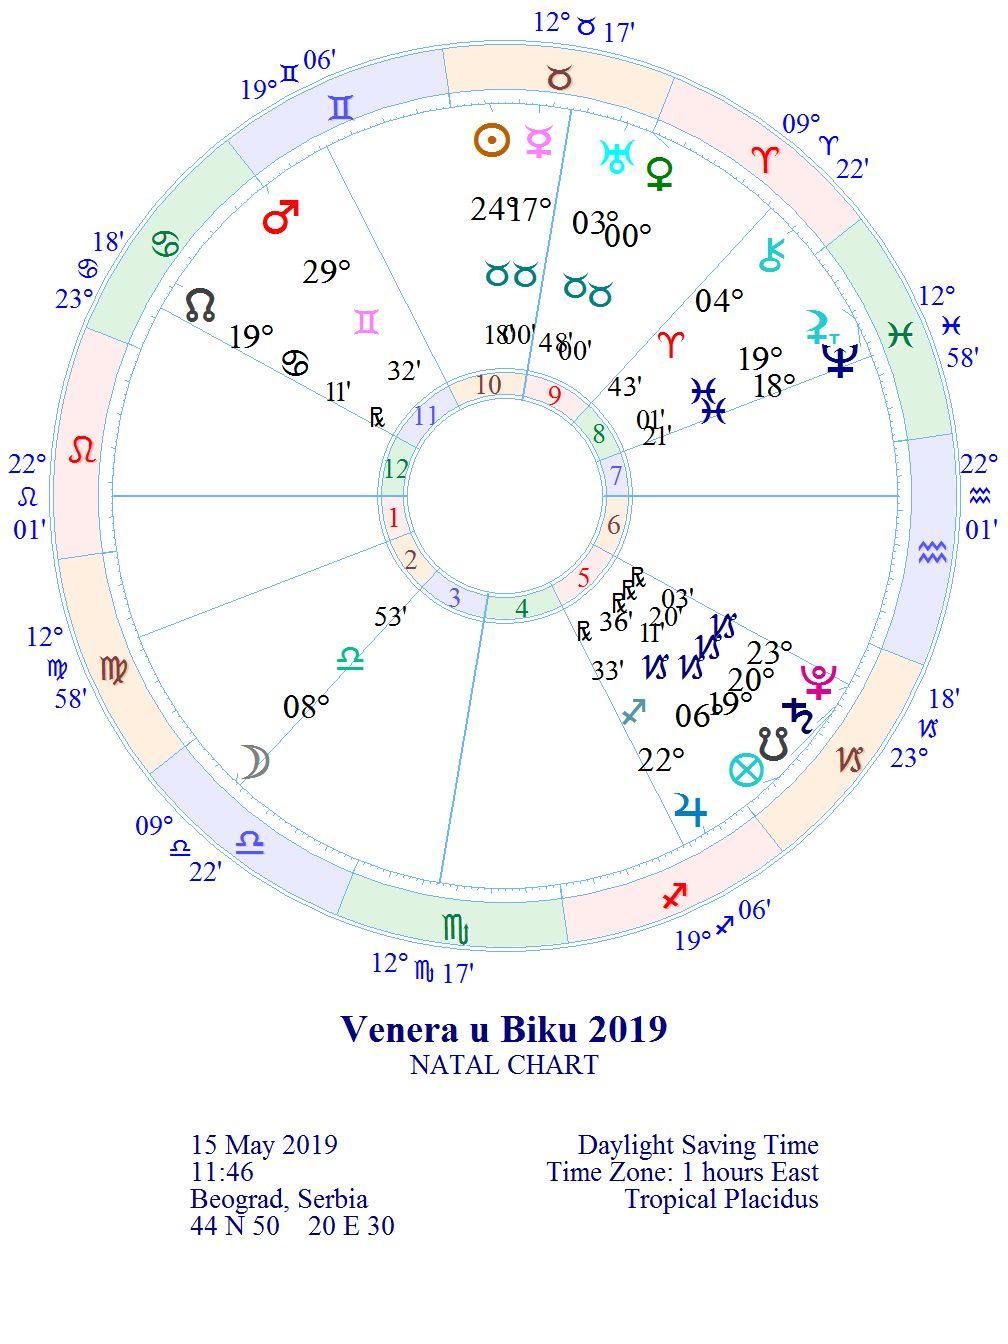 Venera u tranzitu kroz zodijački znak Bika *tranzit 2019.